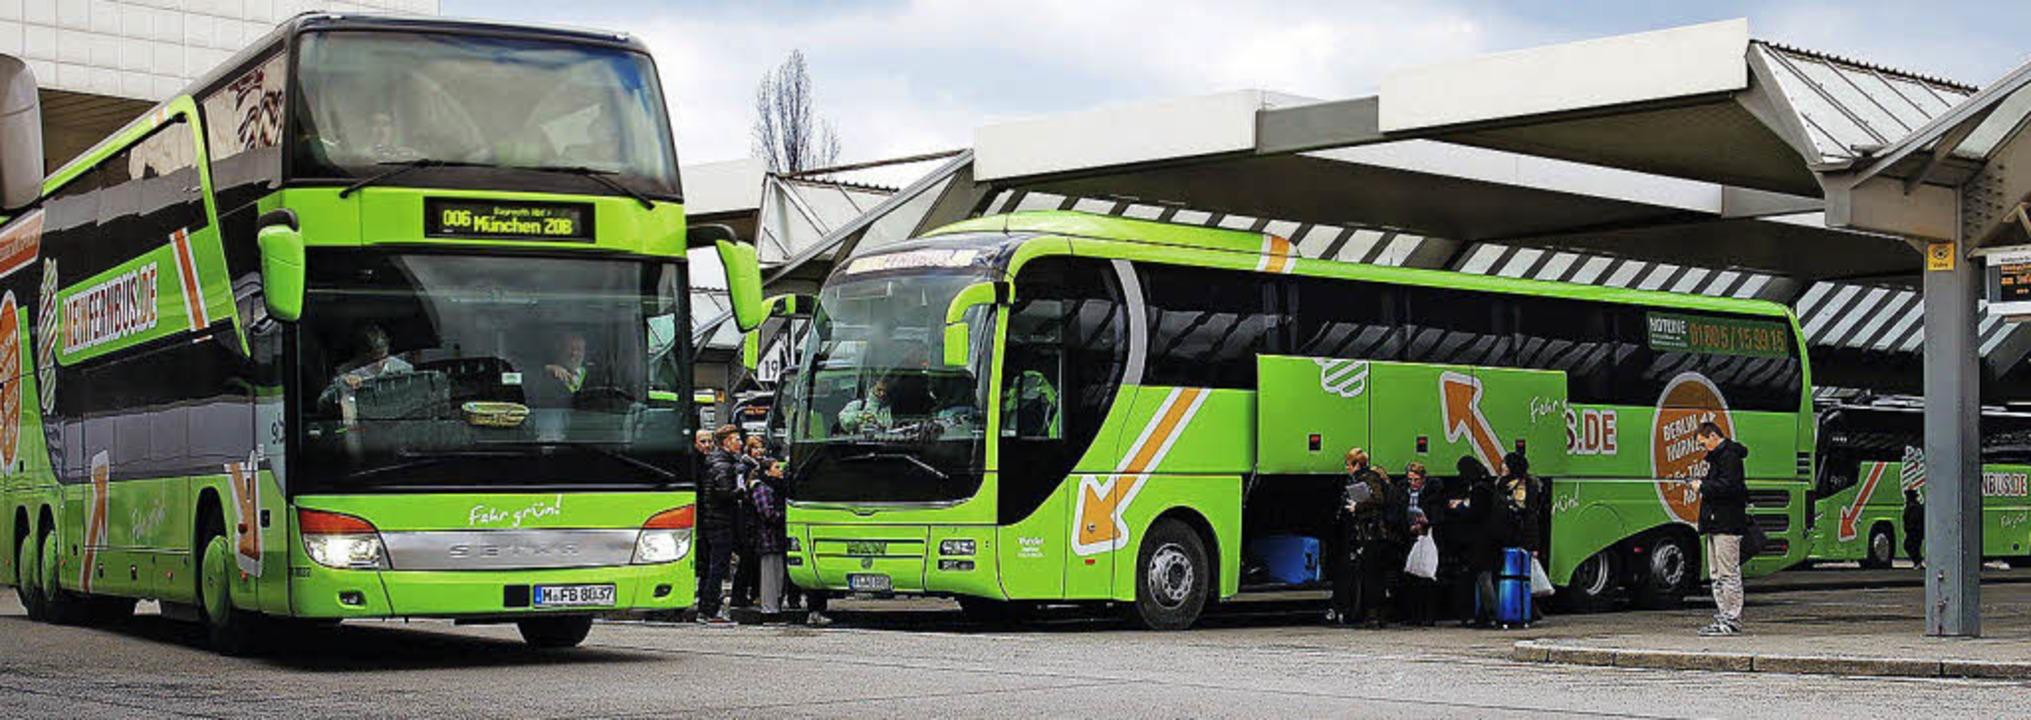 Fernbus Neckarsulm